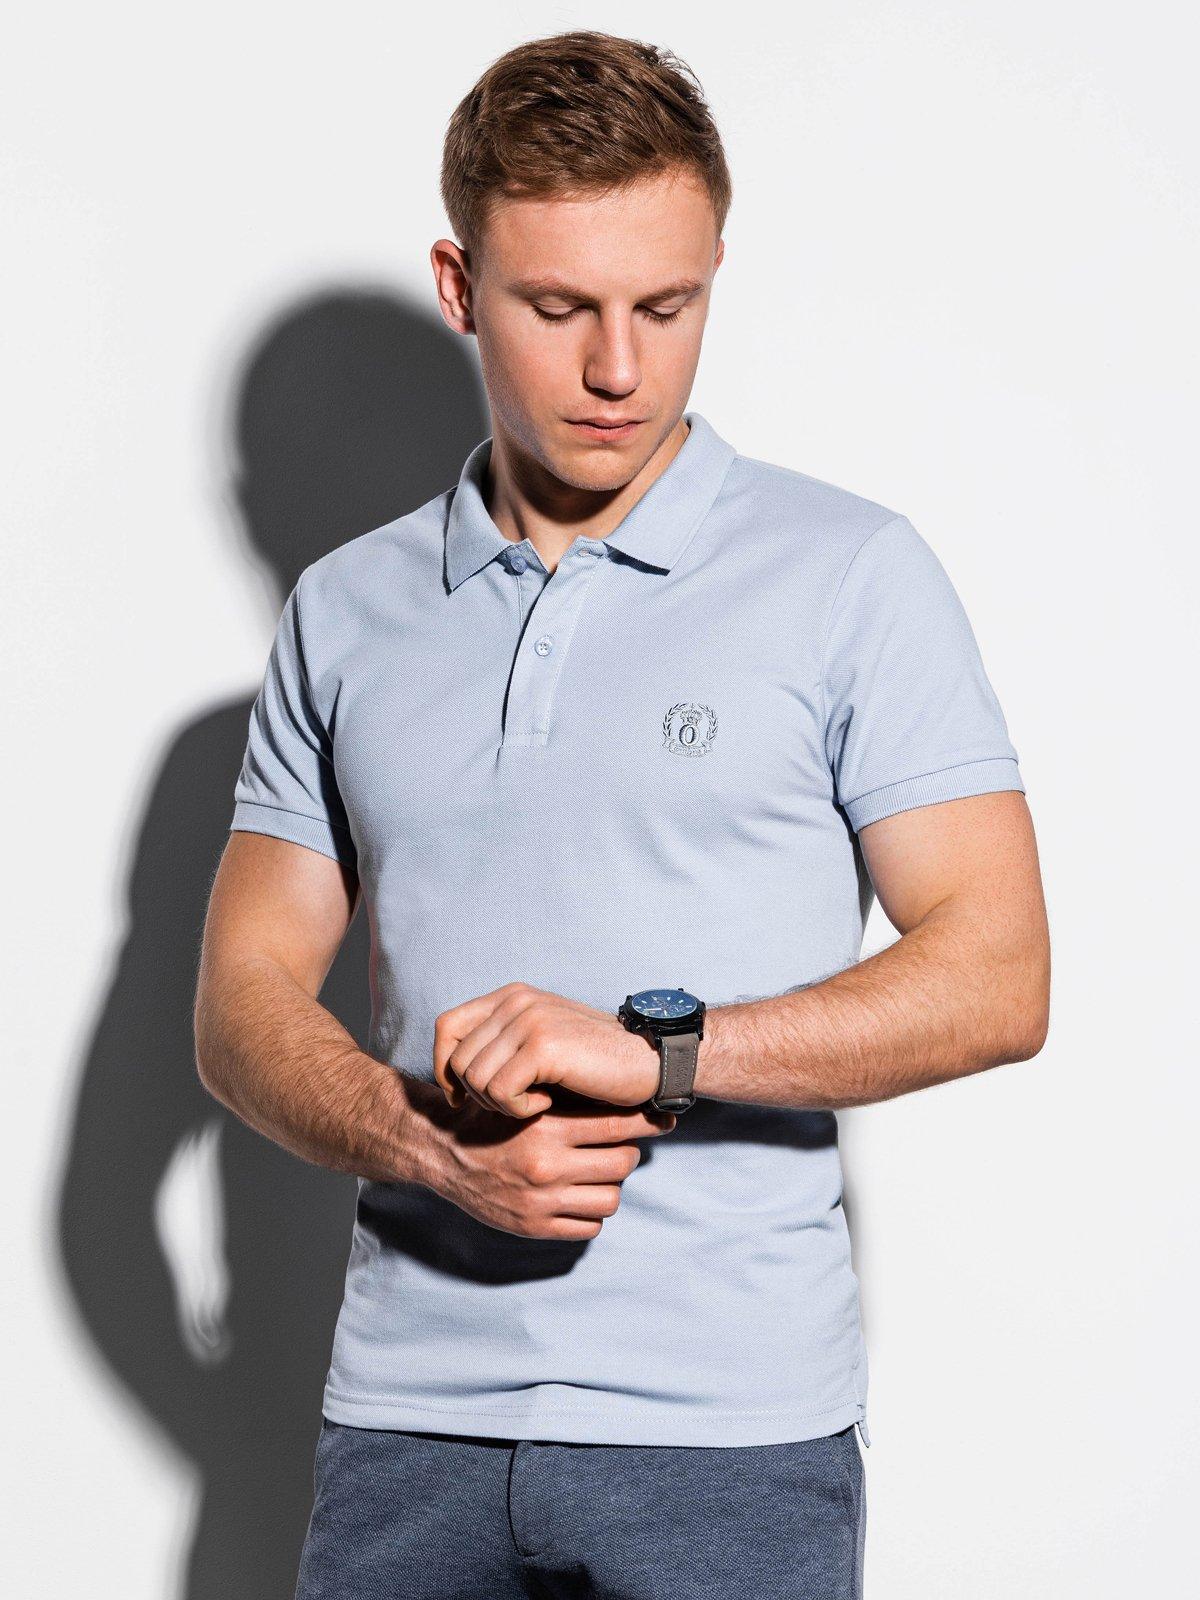 Koszulka męska Polo beznadruku S1048 - błękitna